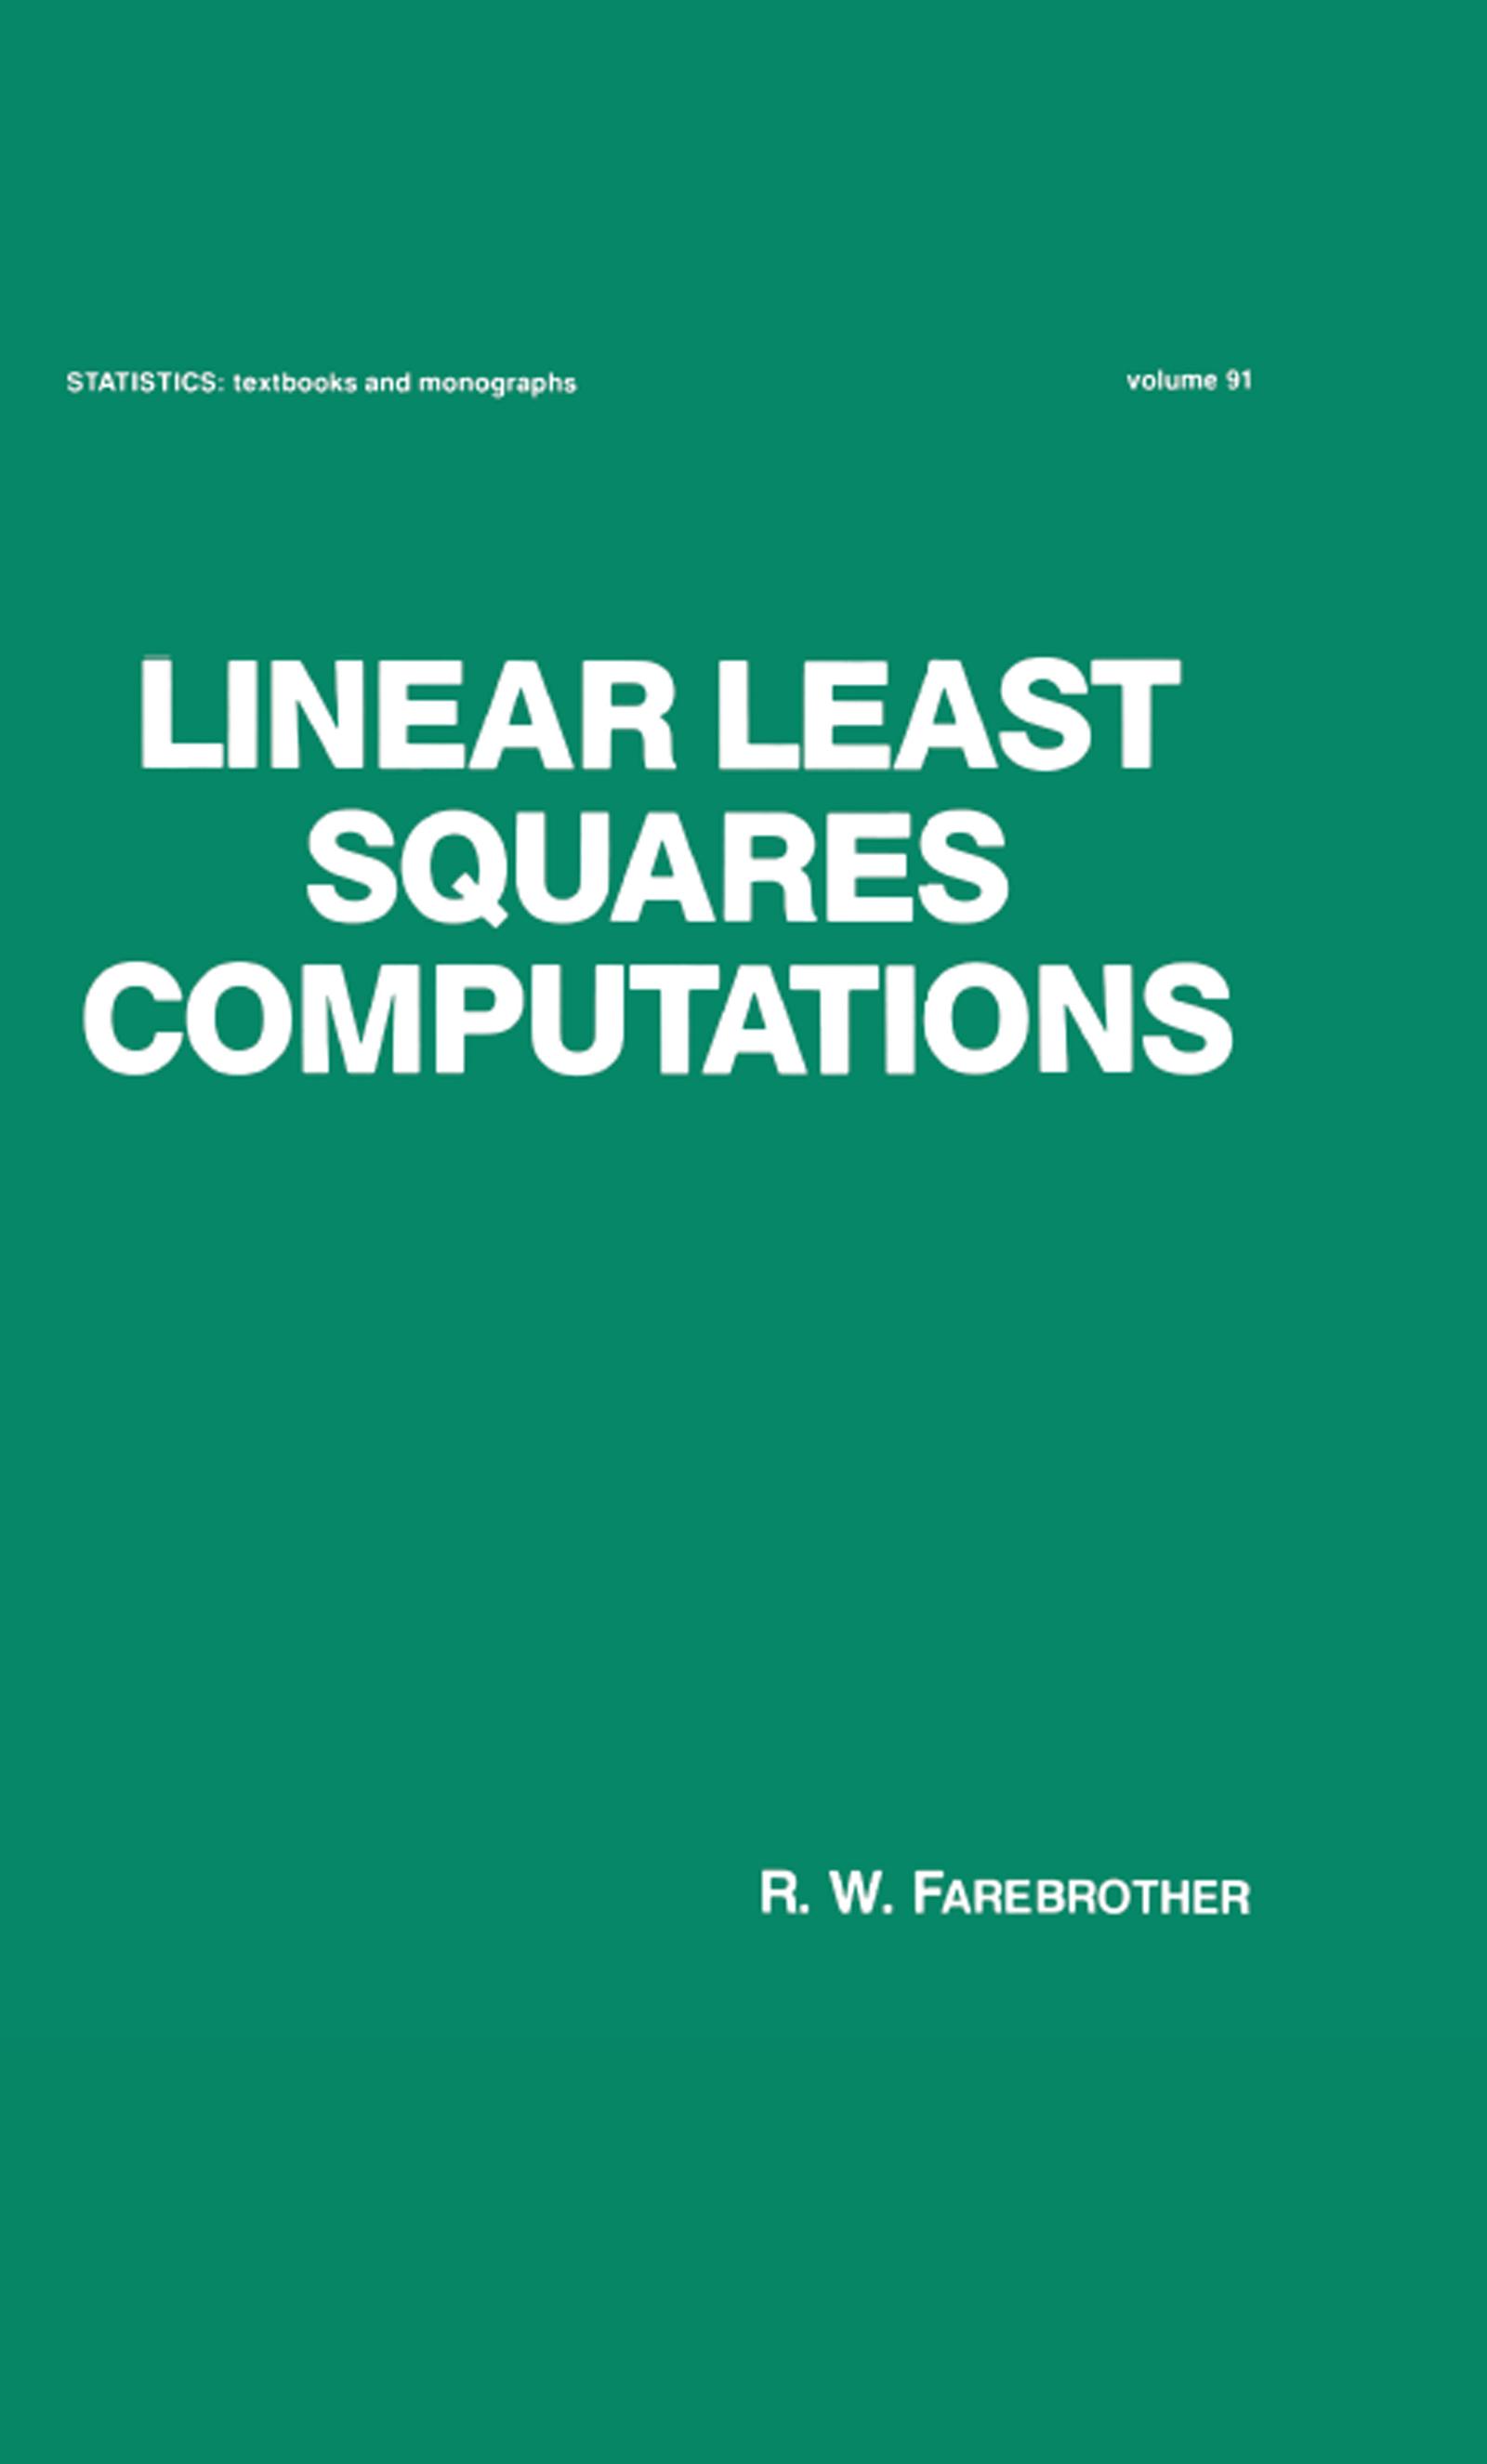 Linear Least Squares Computations